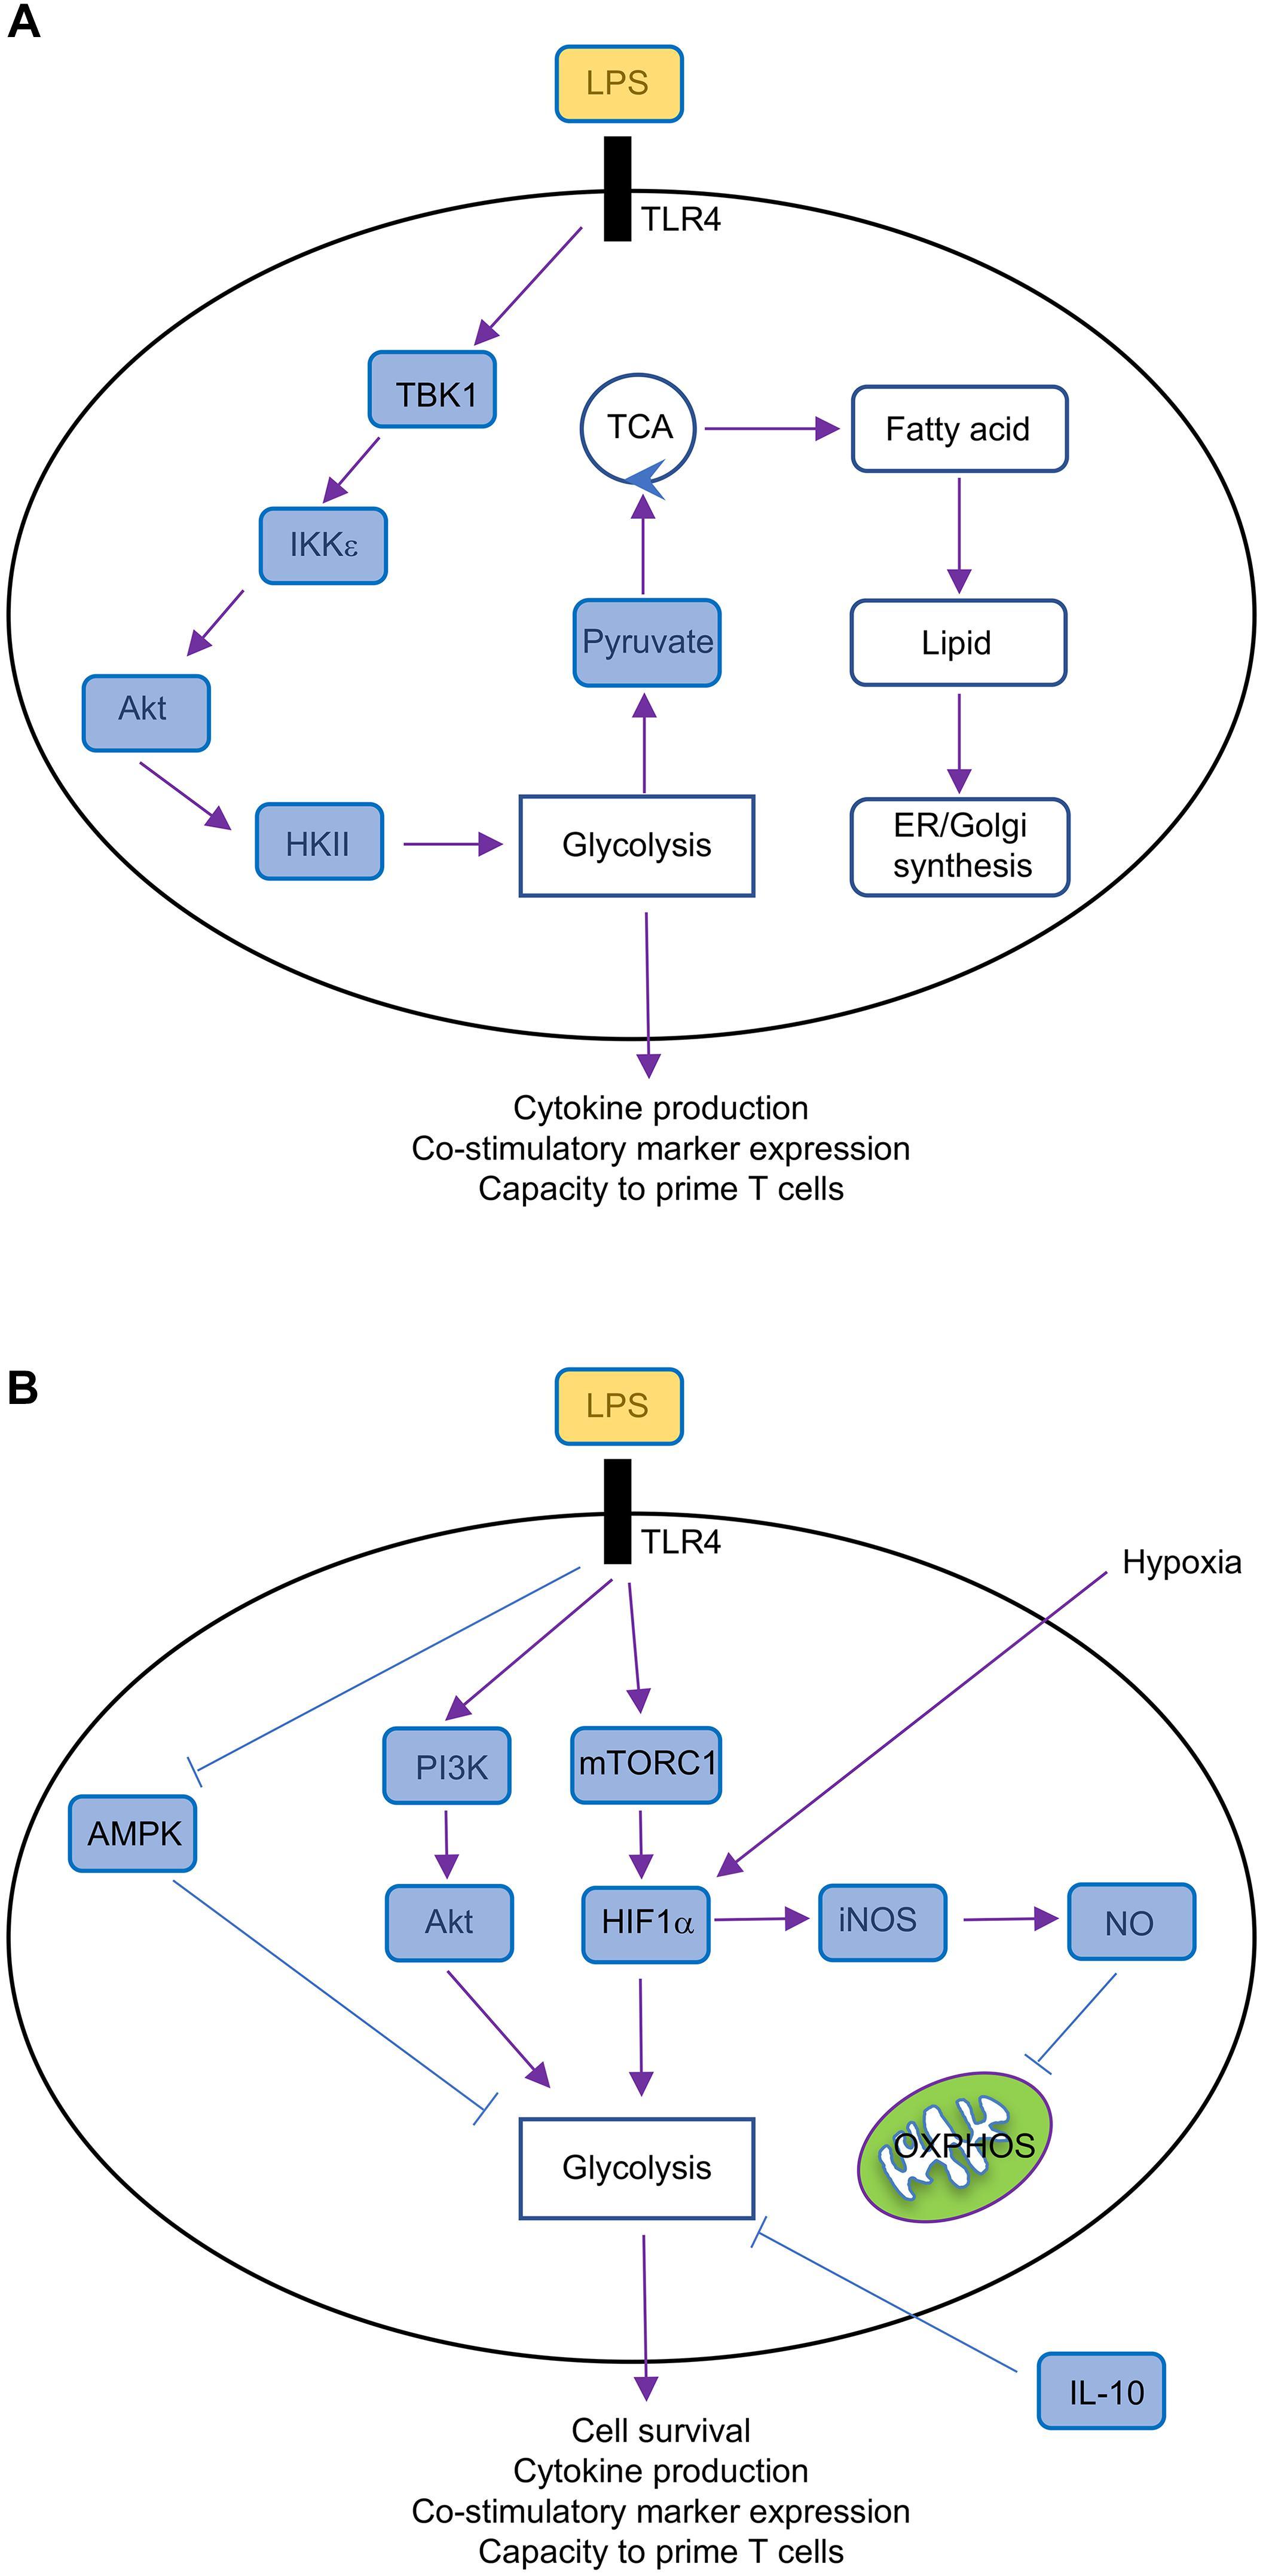 Frontiers | Emerging Roles of Cellular Metabolism in Regulating